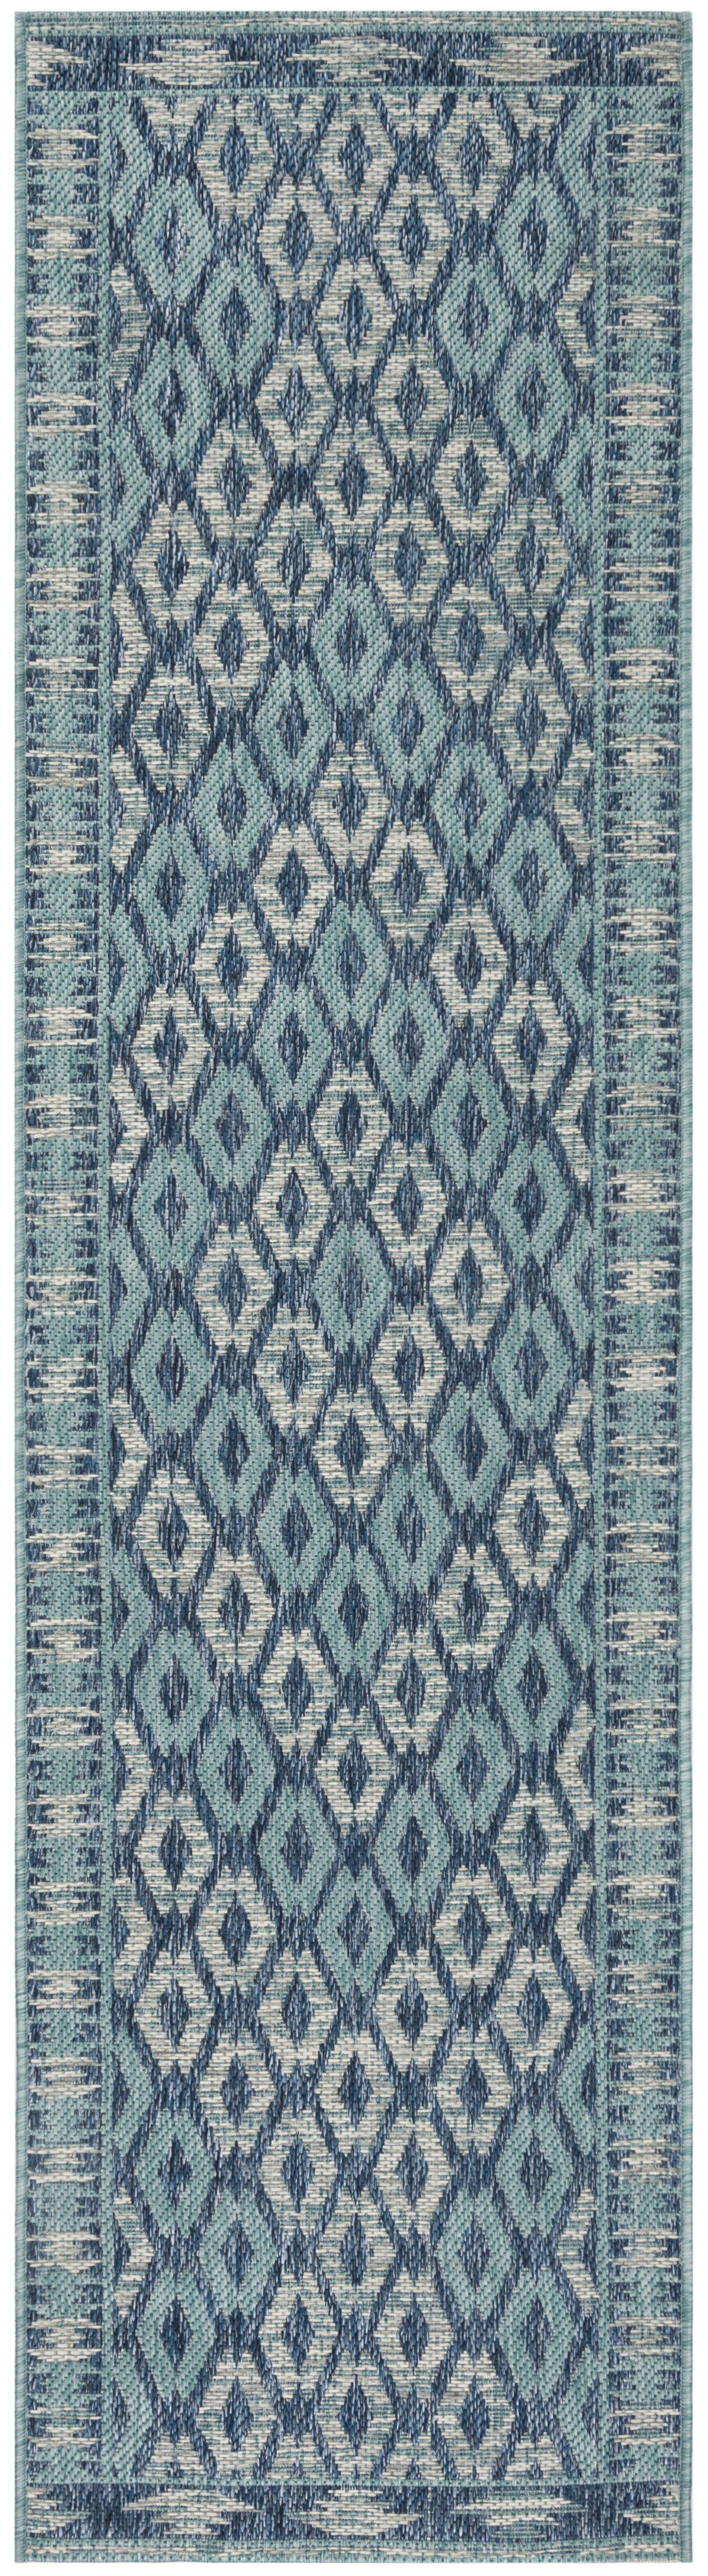 Mathes Navy/Aqua Indoor/Outdoor Area Rug Rug Size: Rectangle 9' x 12'